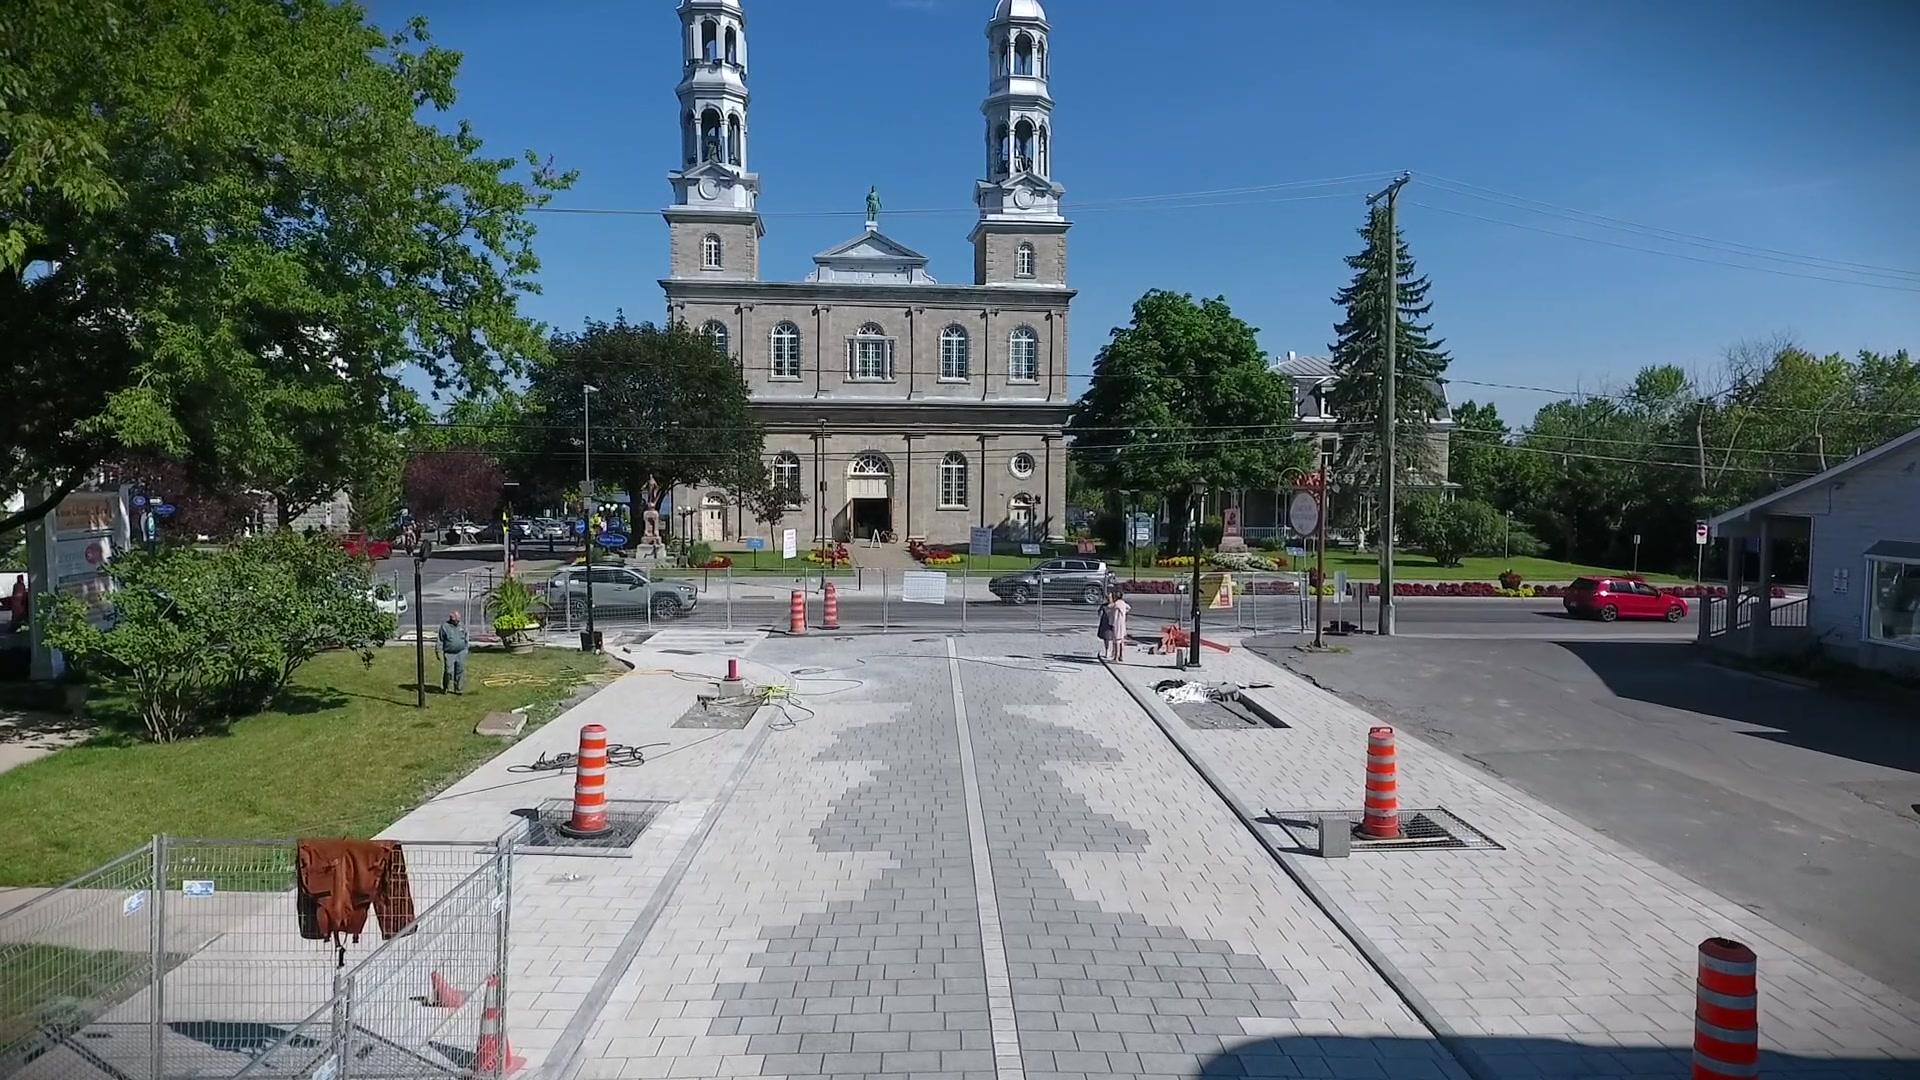 Pavé & paysagiste Boisbriand - Résidentiel - Commercial - Aménagement paysager - Trottoir - Boisbriand